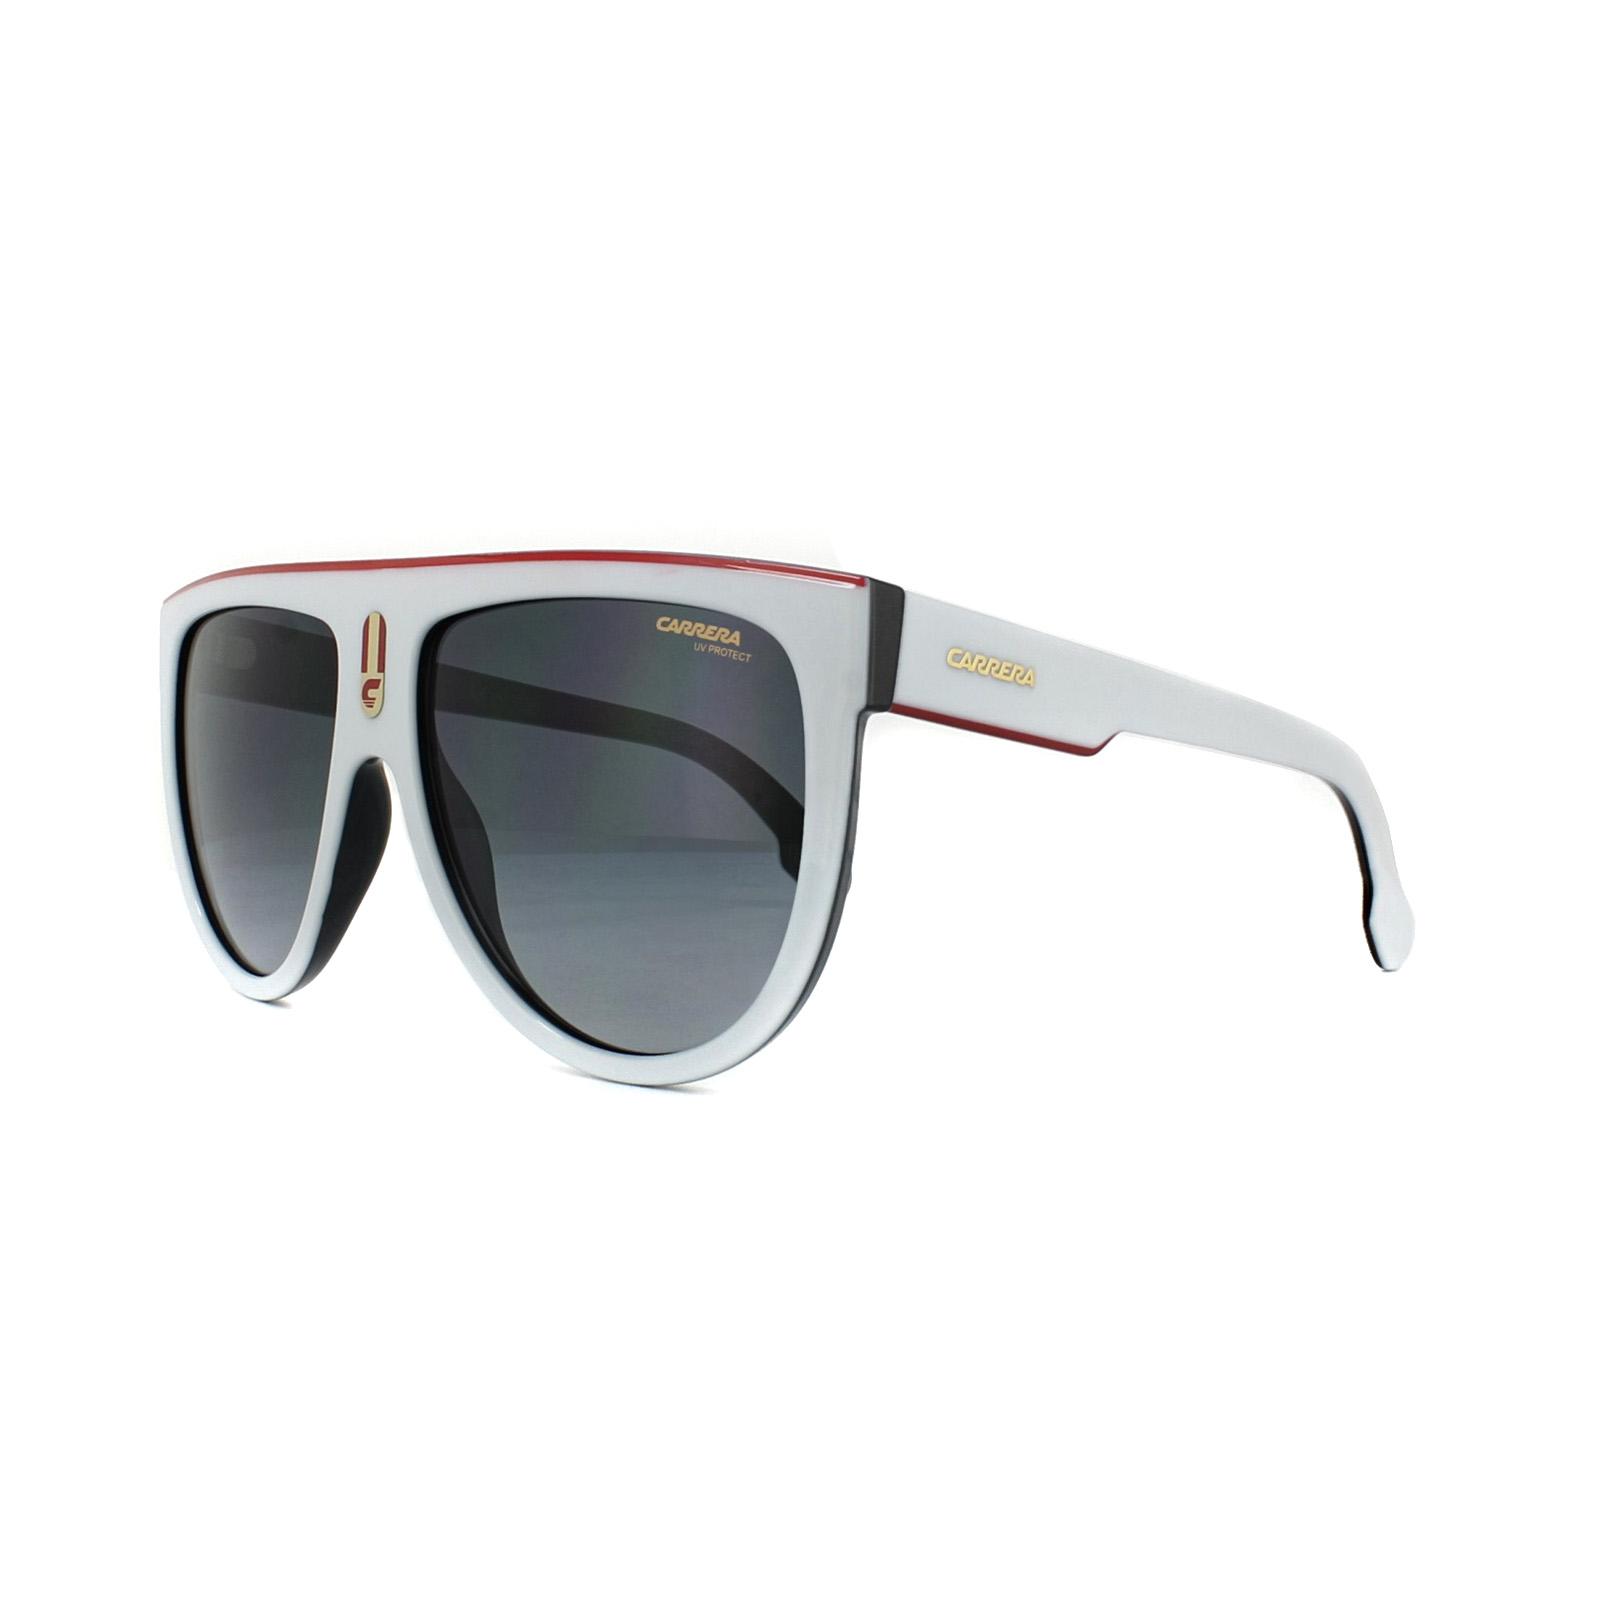 9ba5314573ca0 Carrera Sunglasses Flagtop CCP 9O White Grey Gradient 762753641571 ...